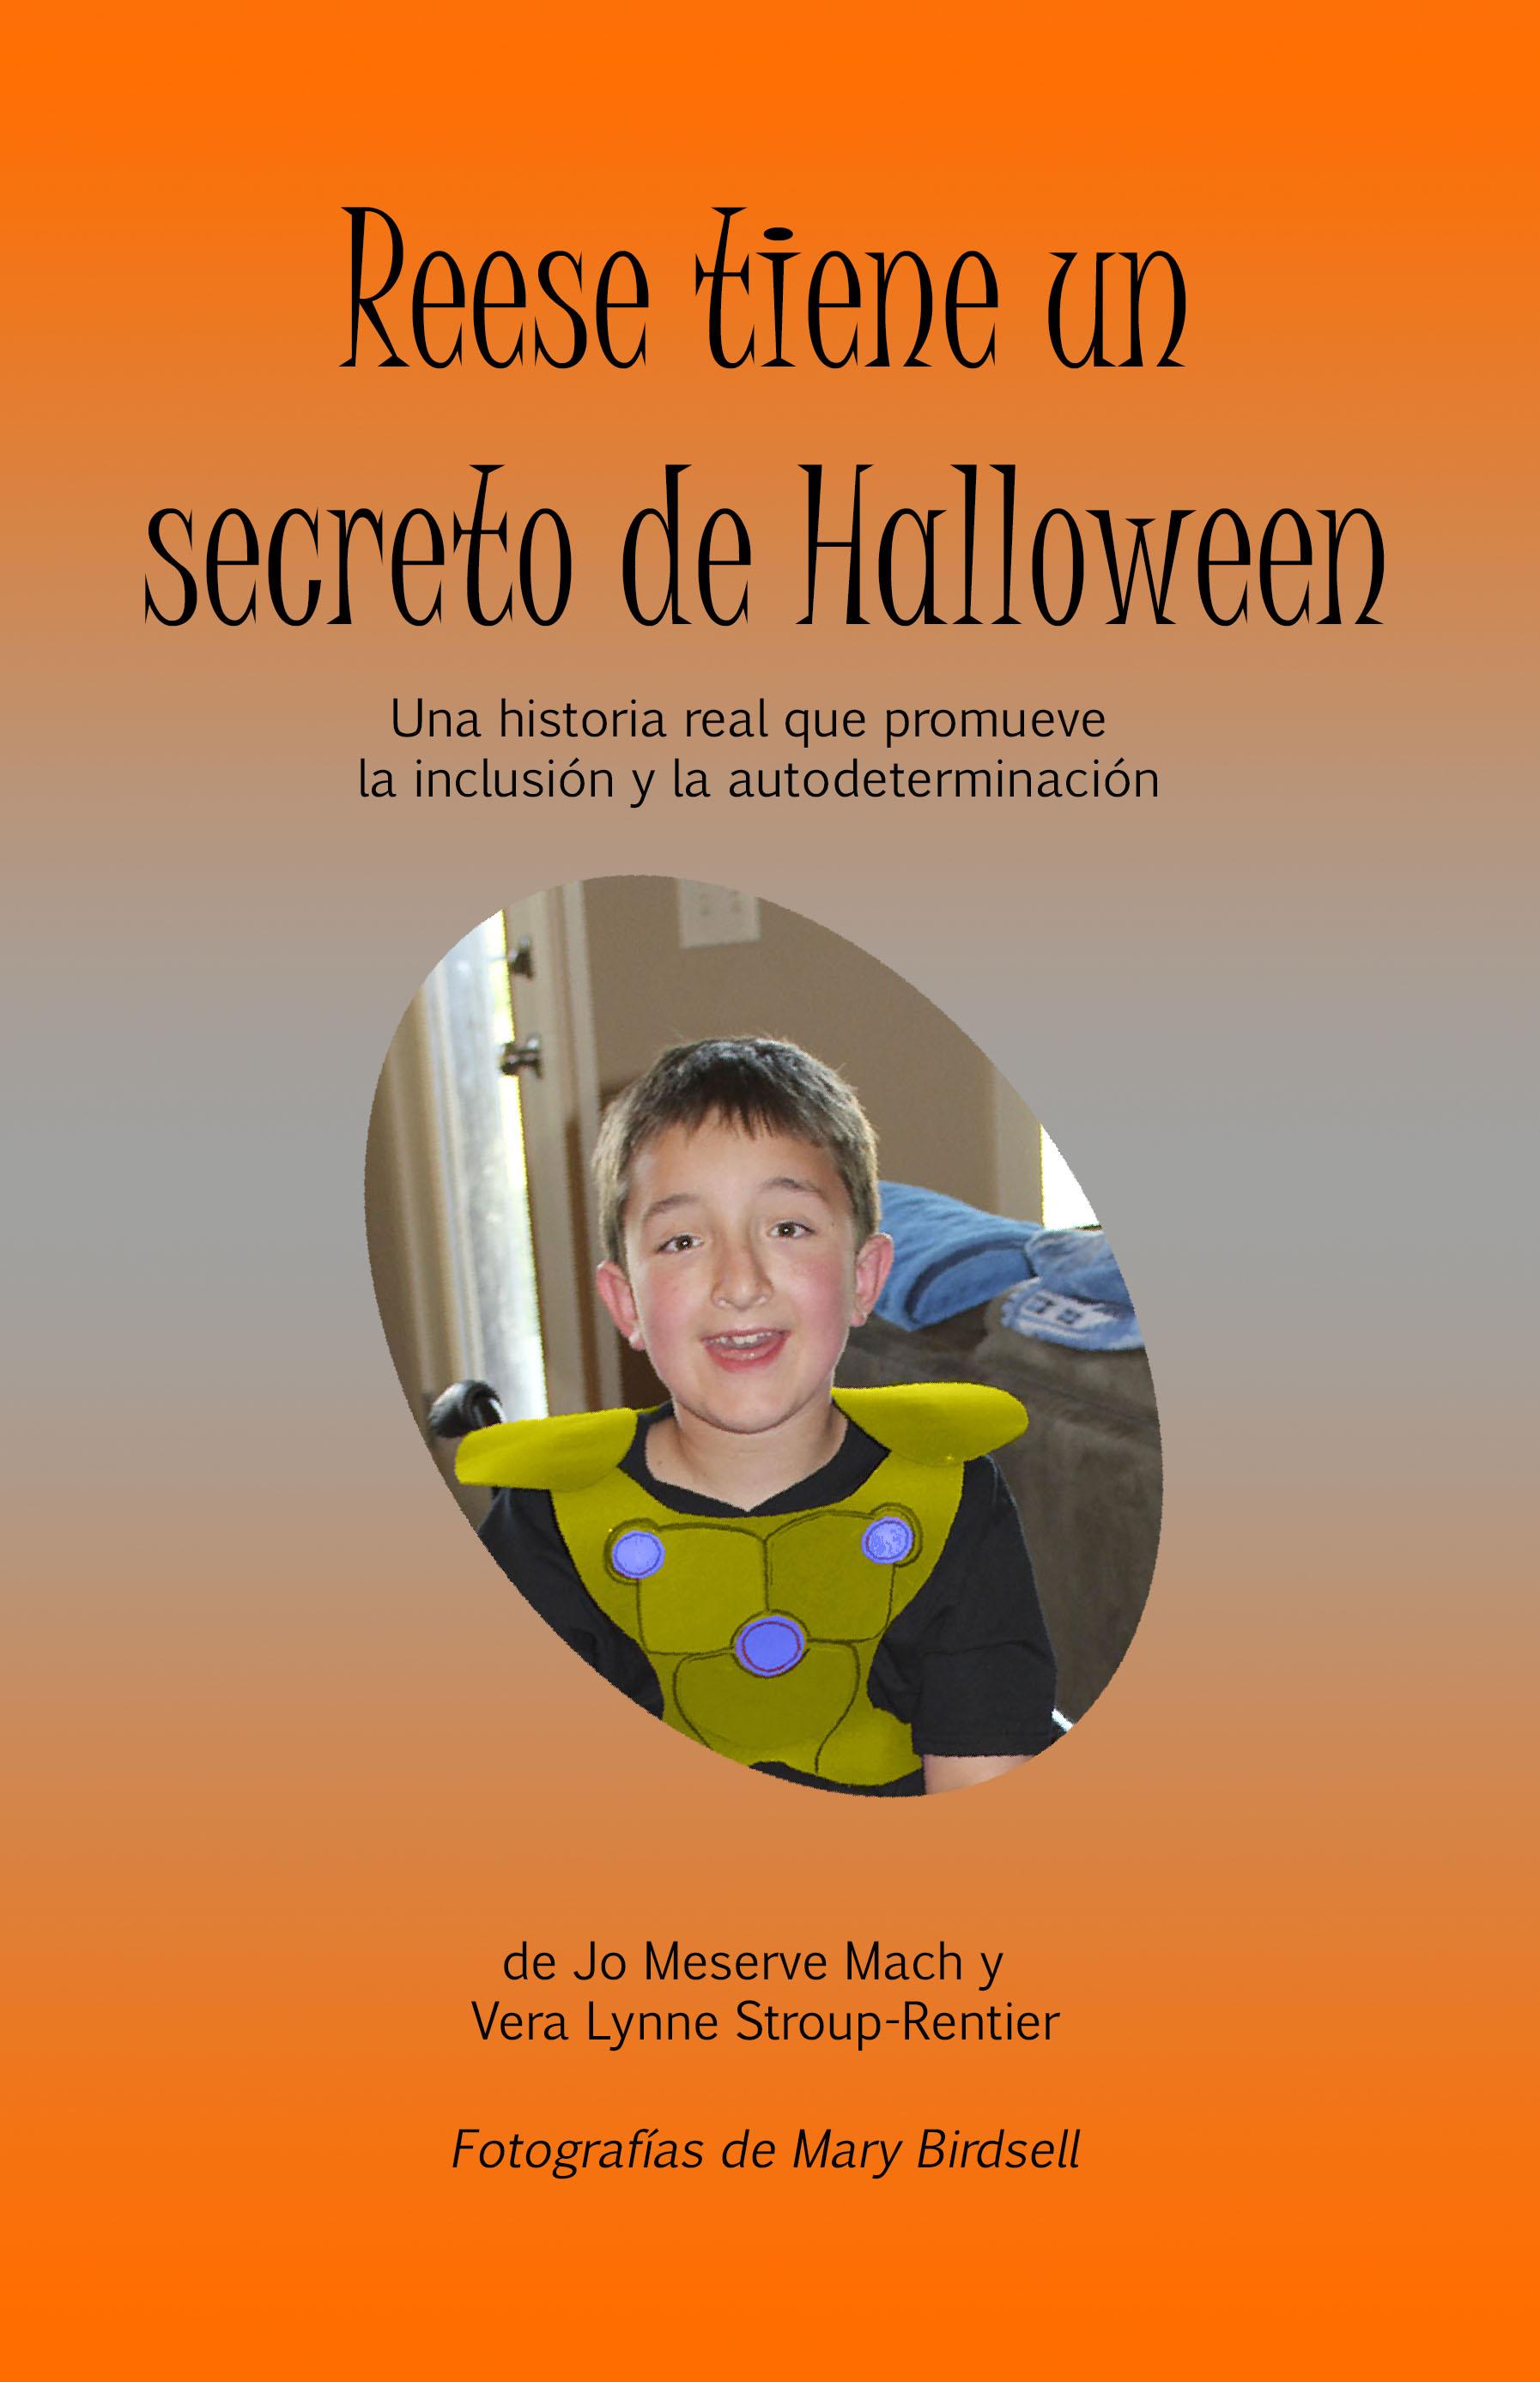 Reese tiene un secreto de Halloween